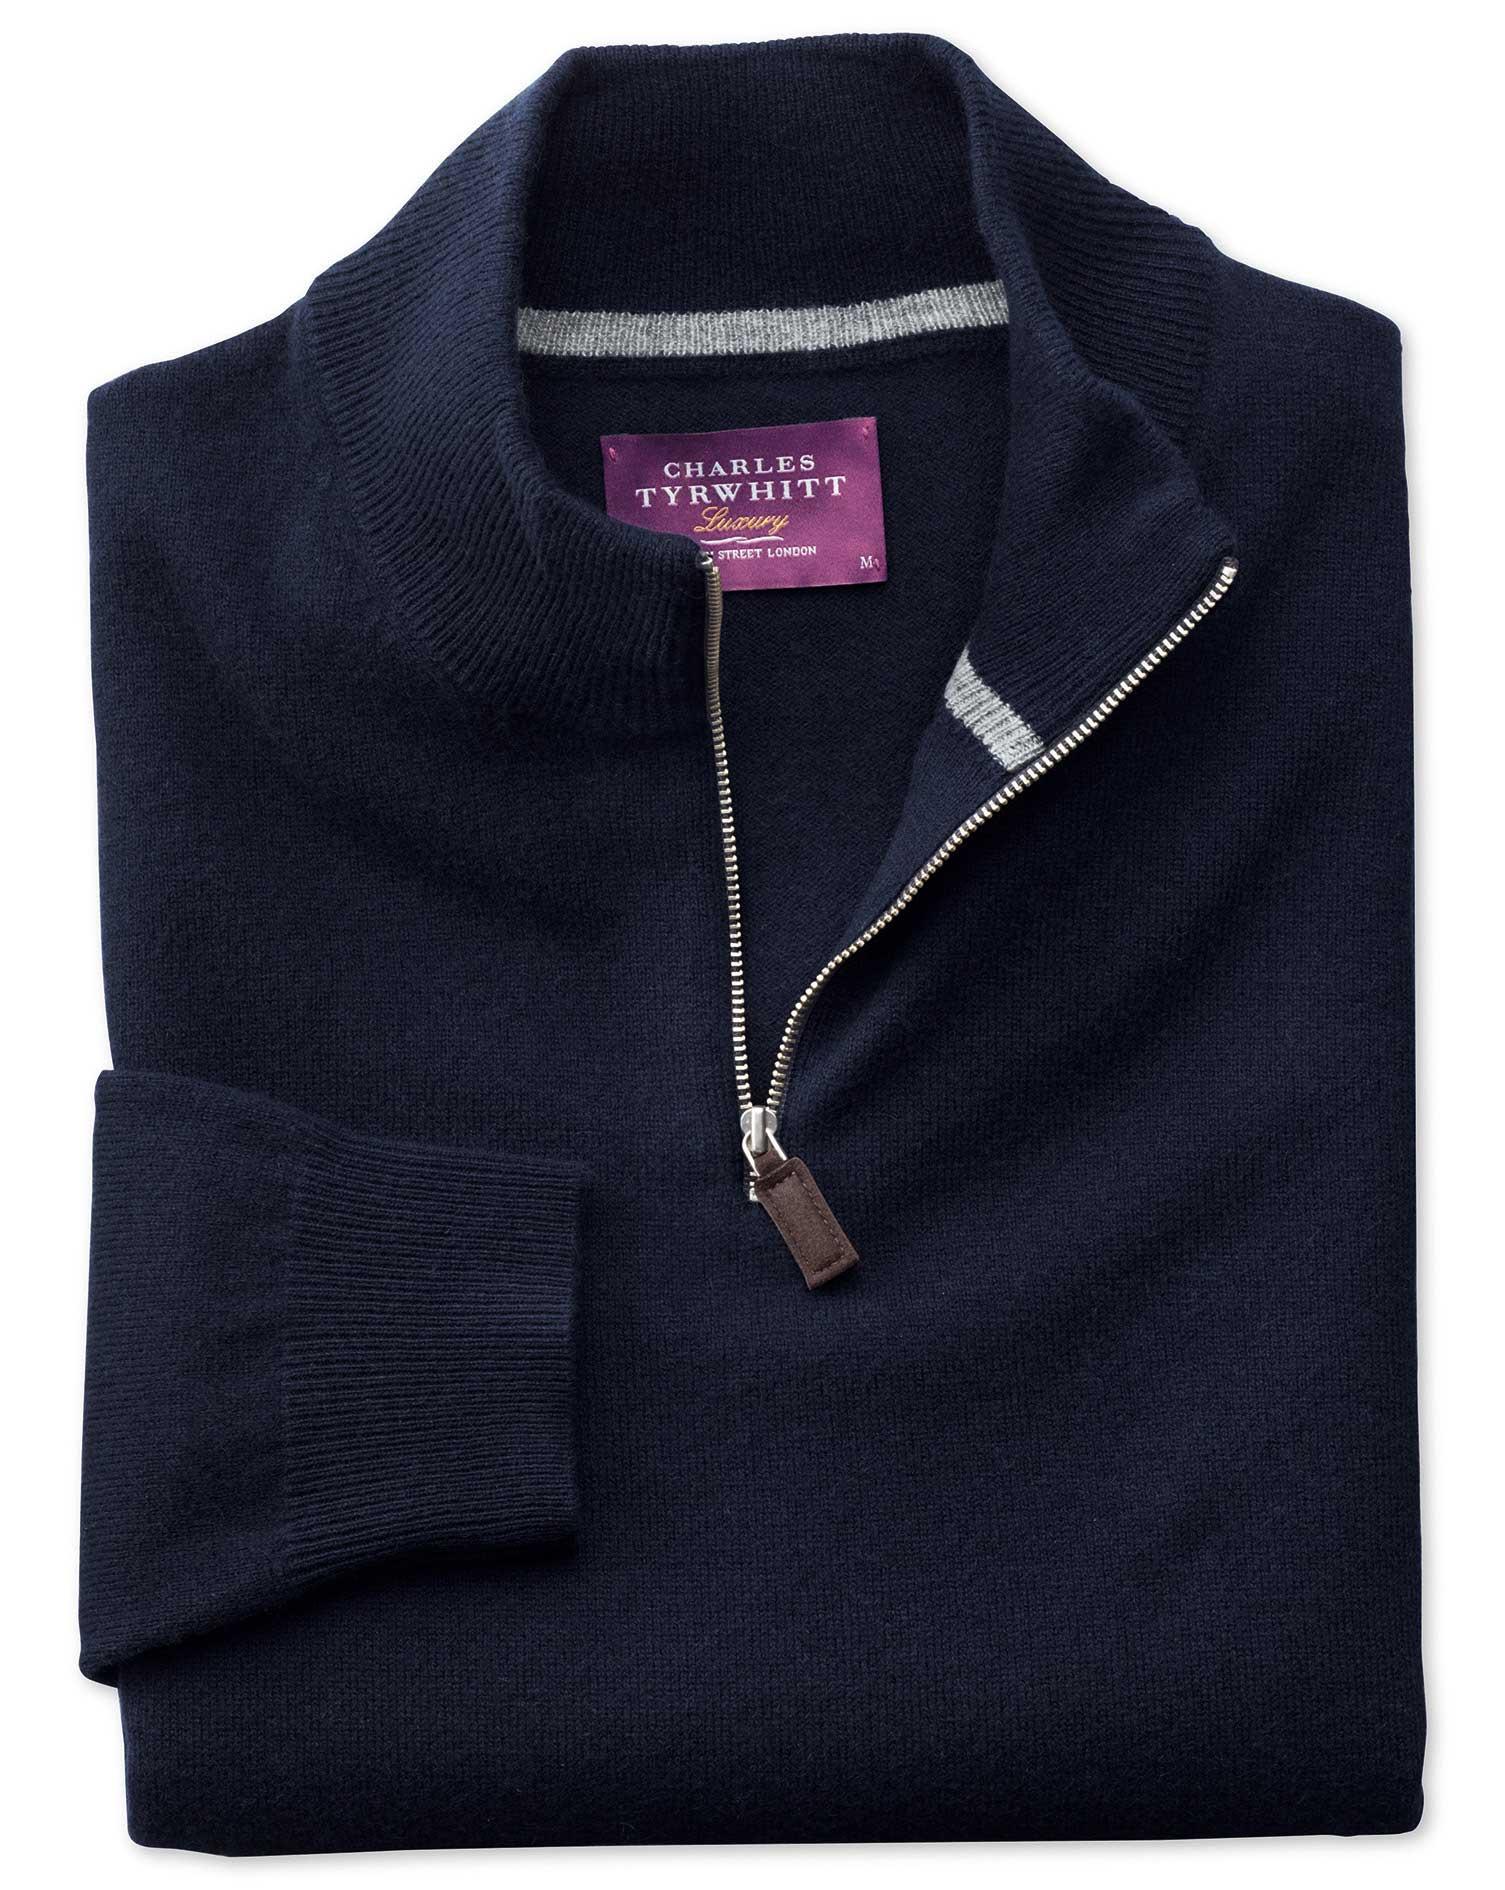 Navy Cashmere Zip Neck Jumper Size XXXL by Charles Tyrwhitt